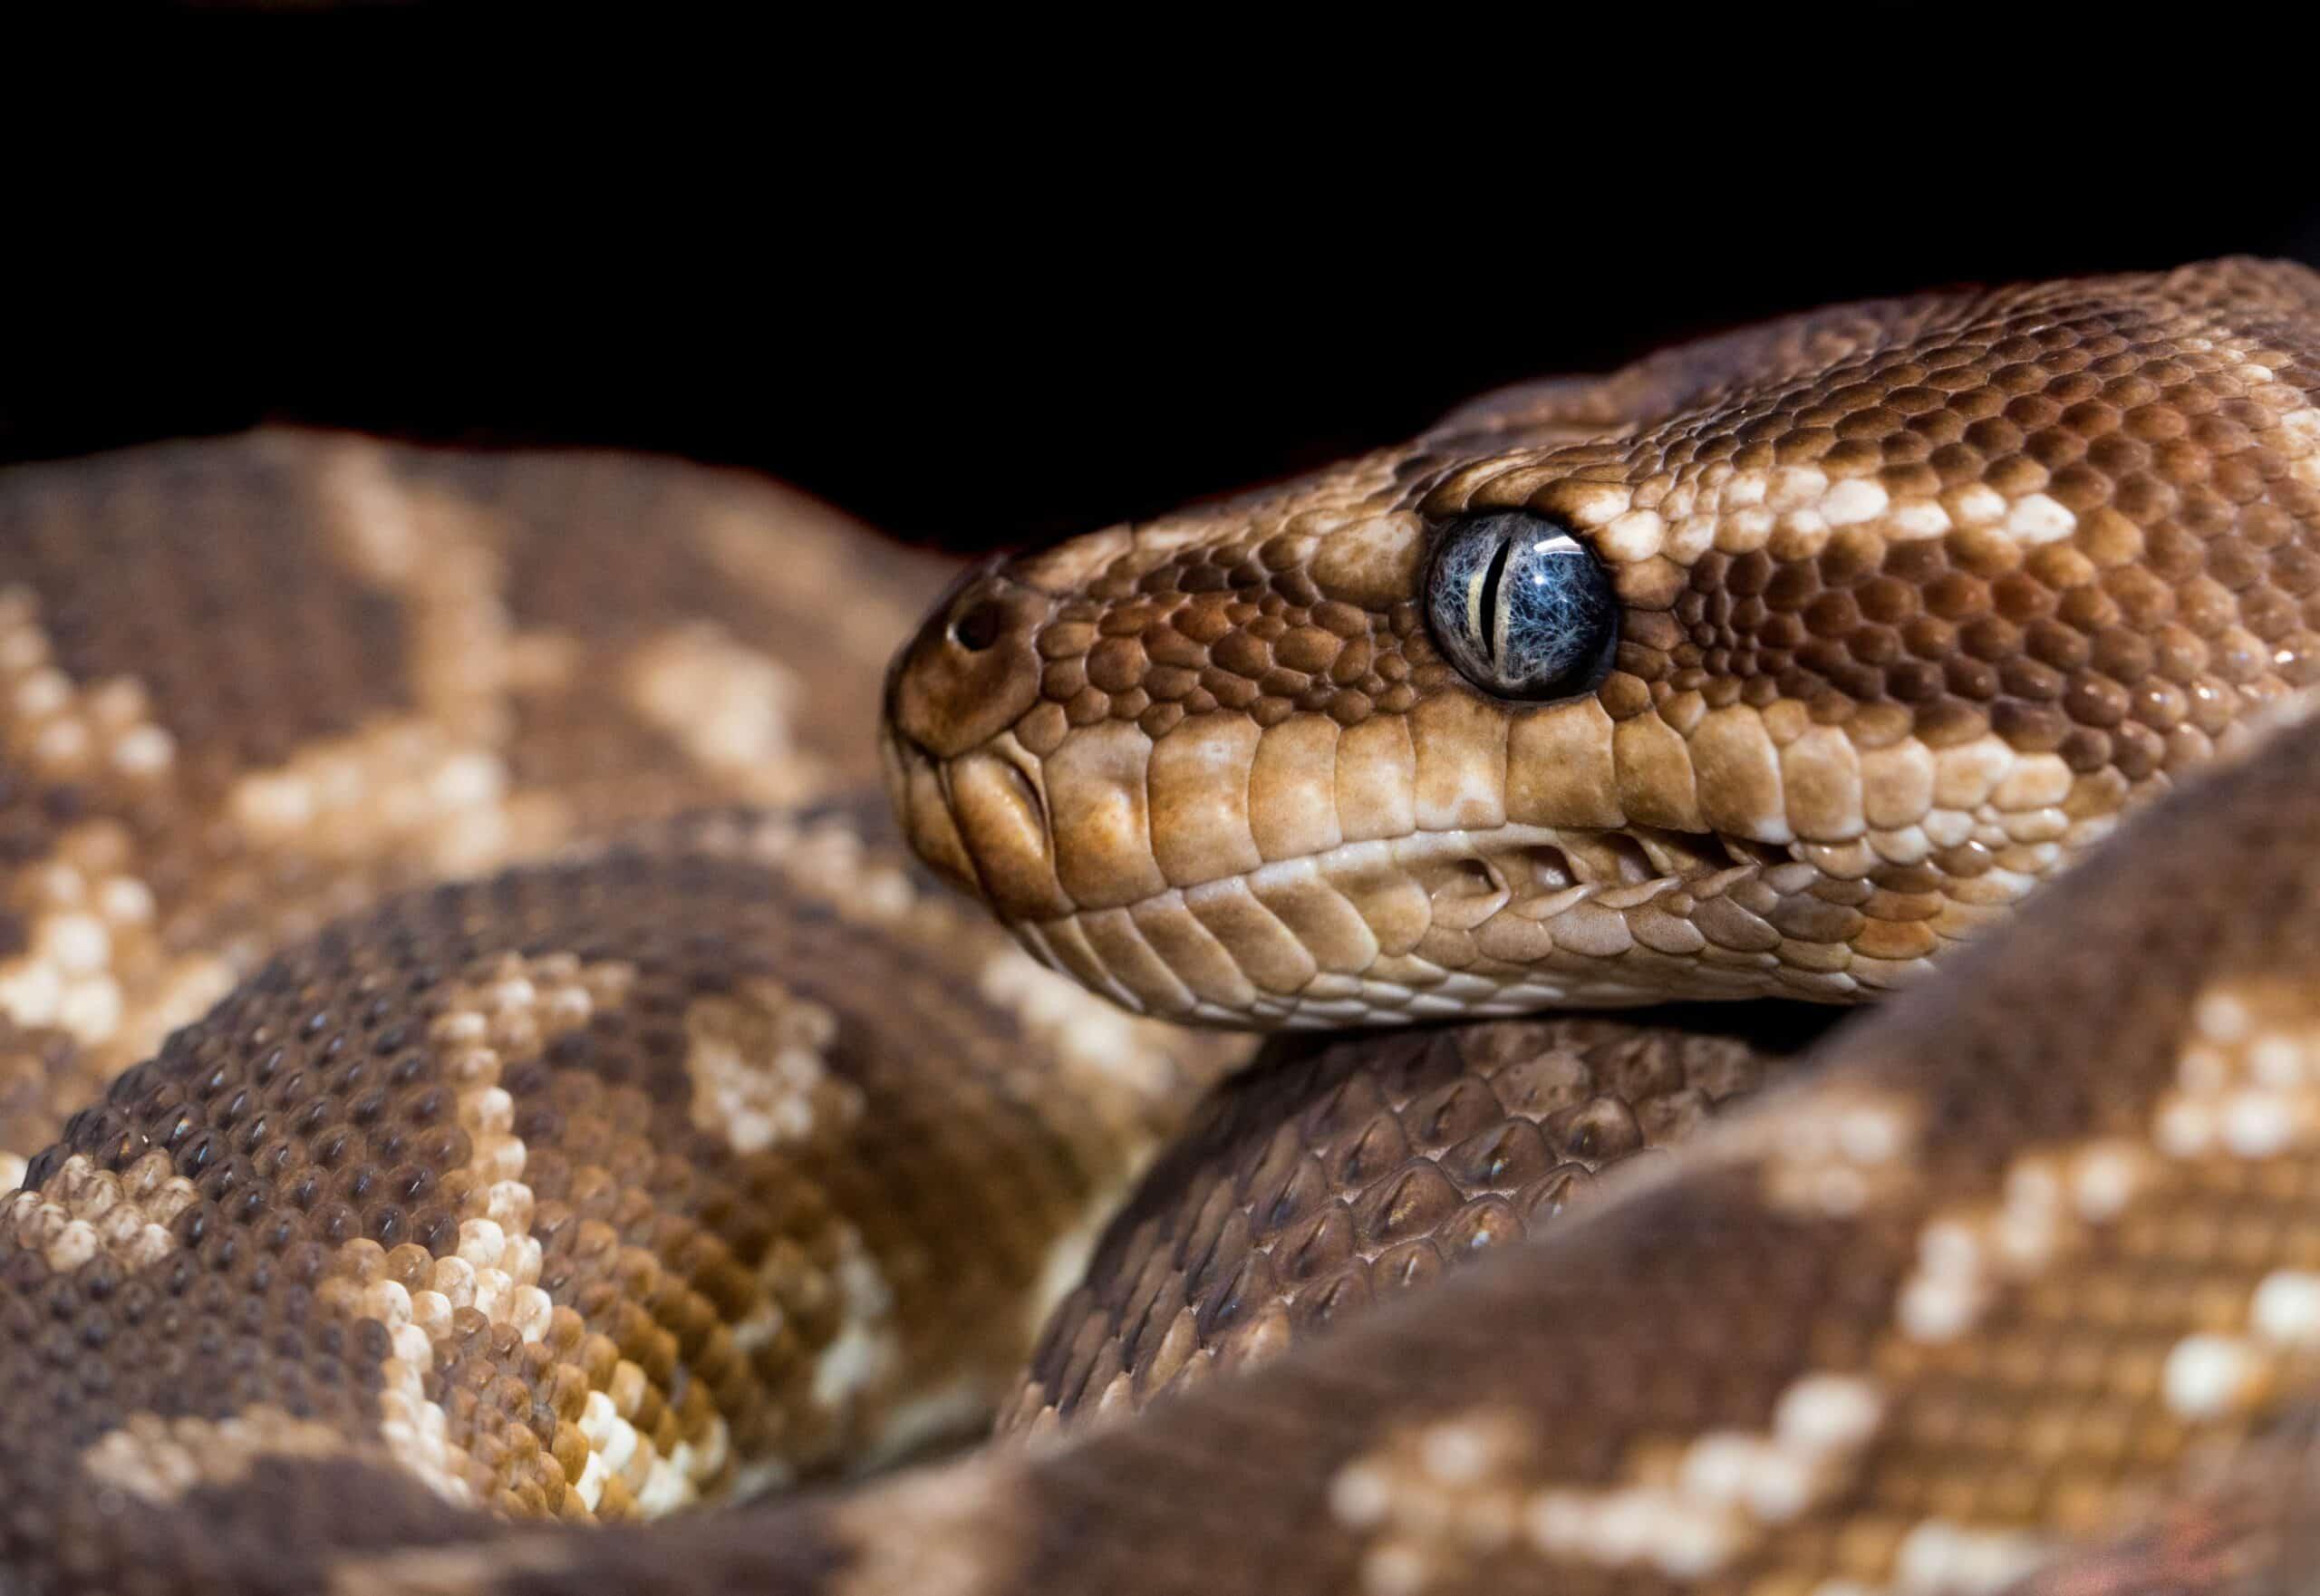 Snake Trapper near me